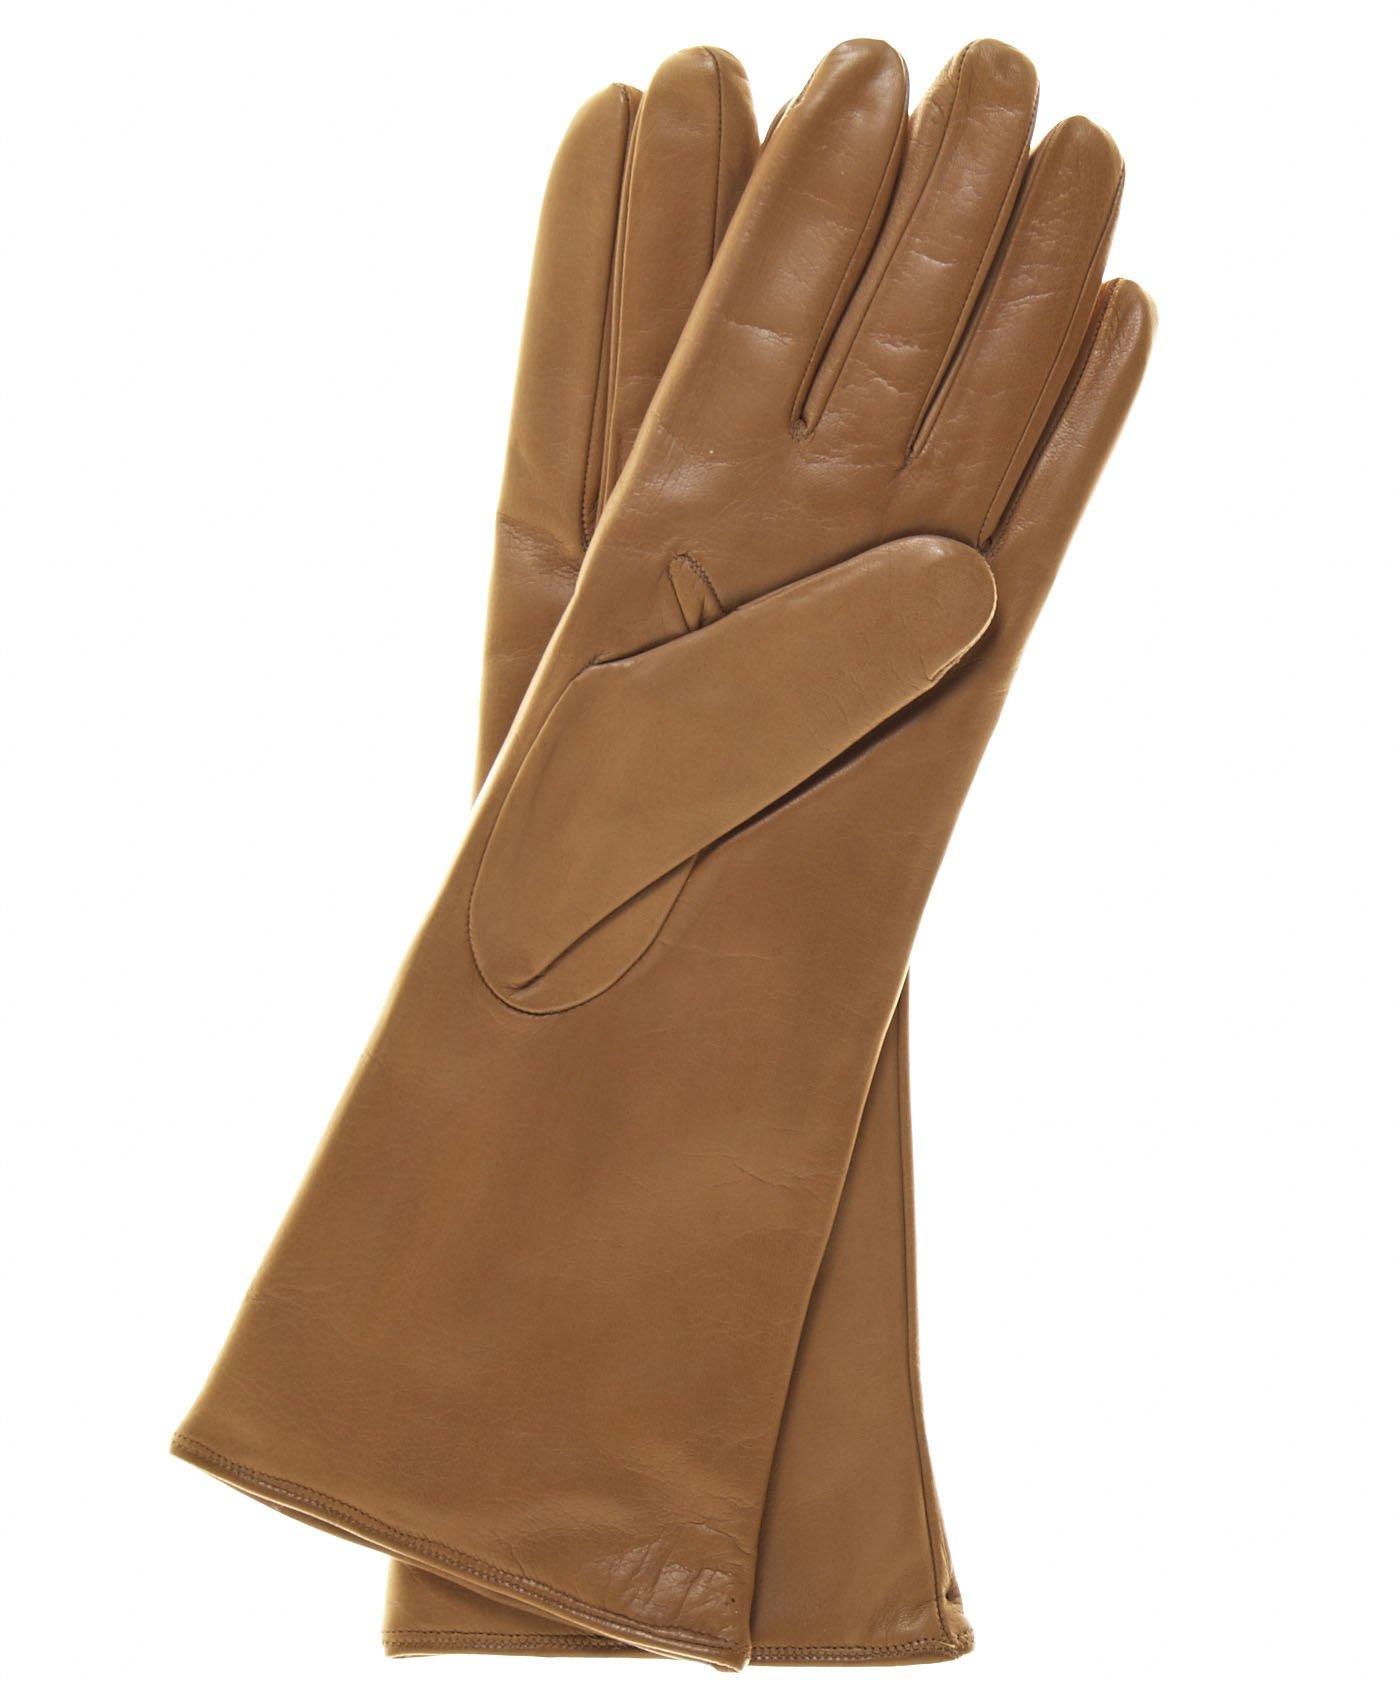 Fratelli Orsini Women's Italian''4 Button Length'' Cashmere Lined Leather Gloves Size 8 1/2 Color Black by Fratelli Orsini (Image #4)